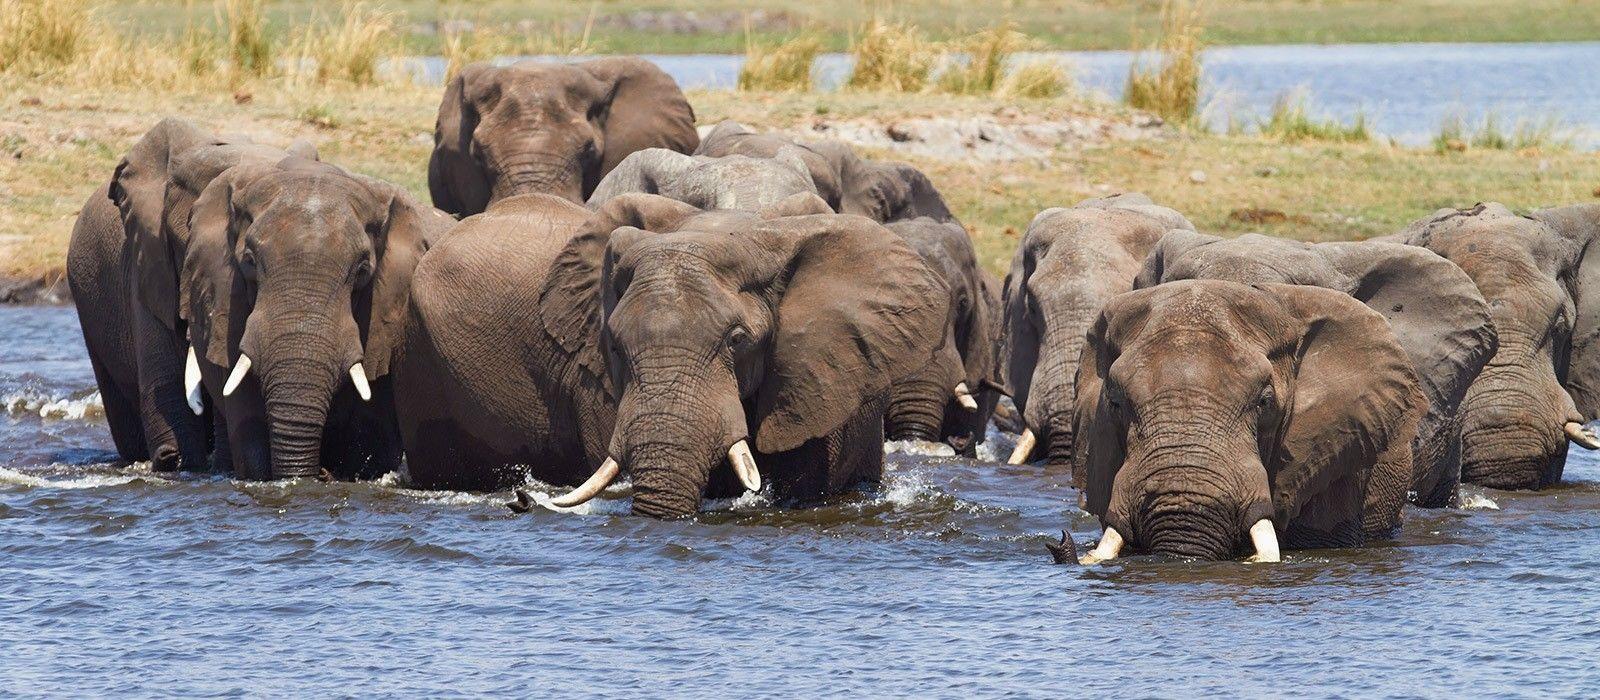 Südafrika, Sambia & Botswana: Safaris, Wein und Wasserfälle Urlaub 2